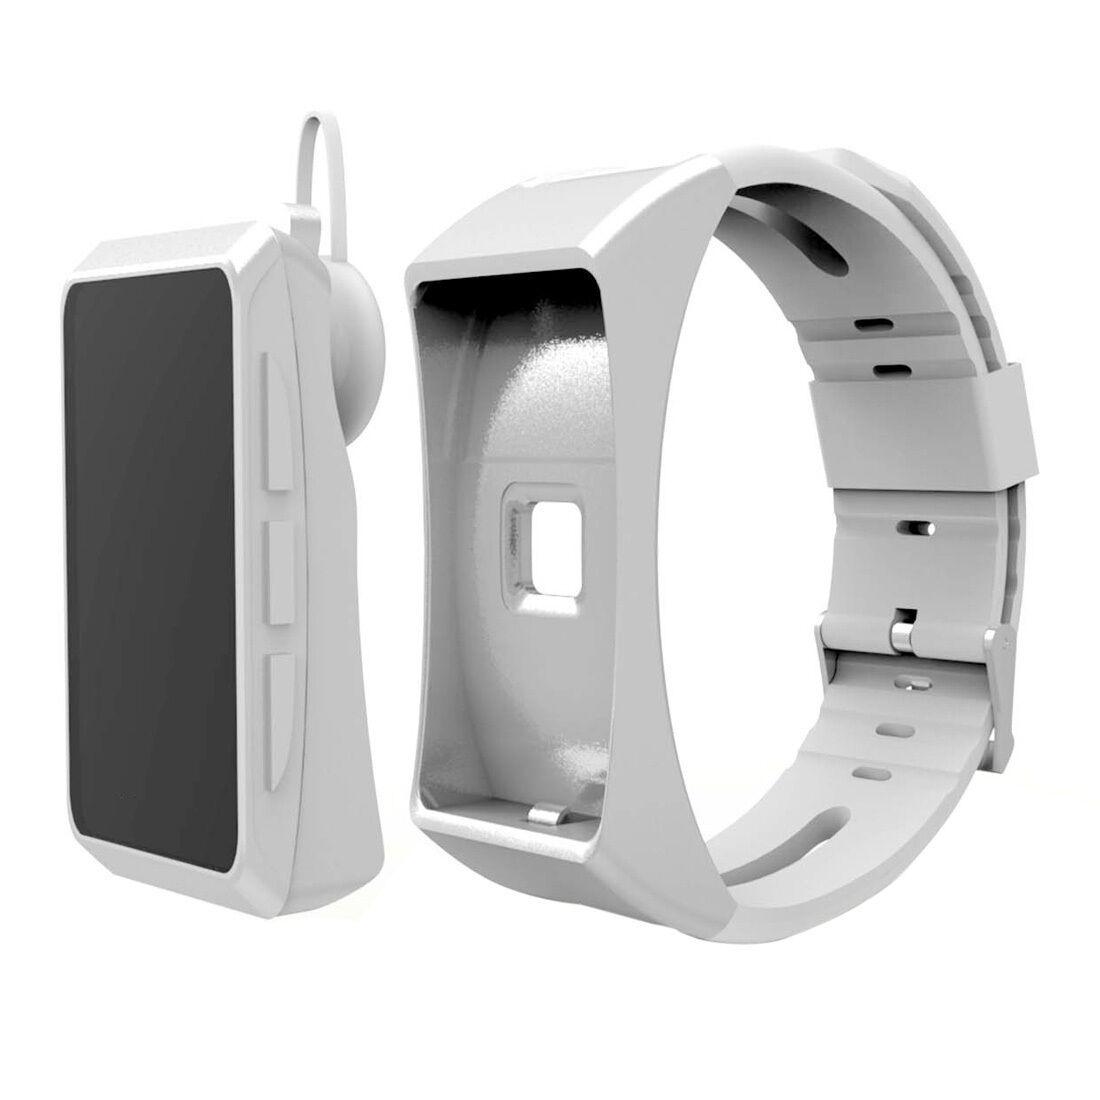 ^qh Earphones headset fitness sport smart watch blueetooth steps pulse calories